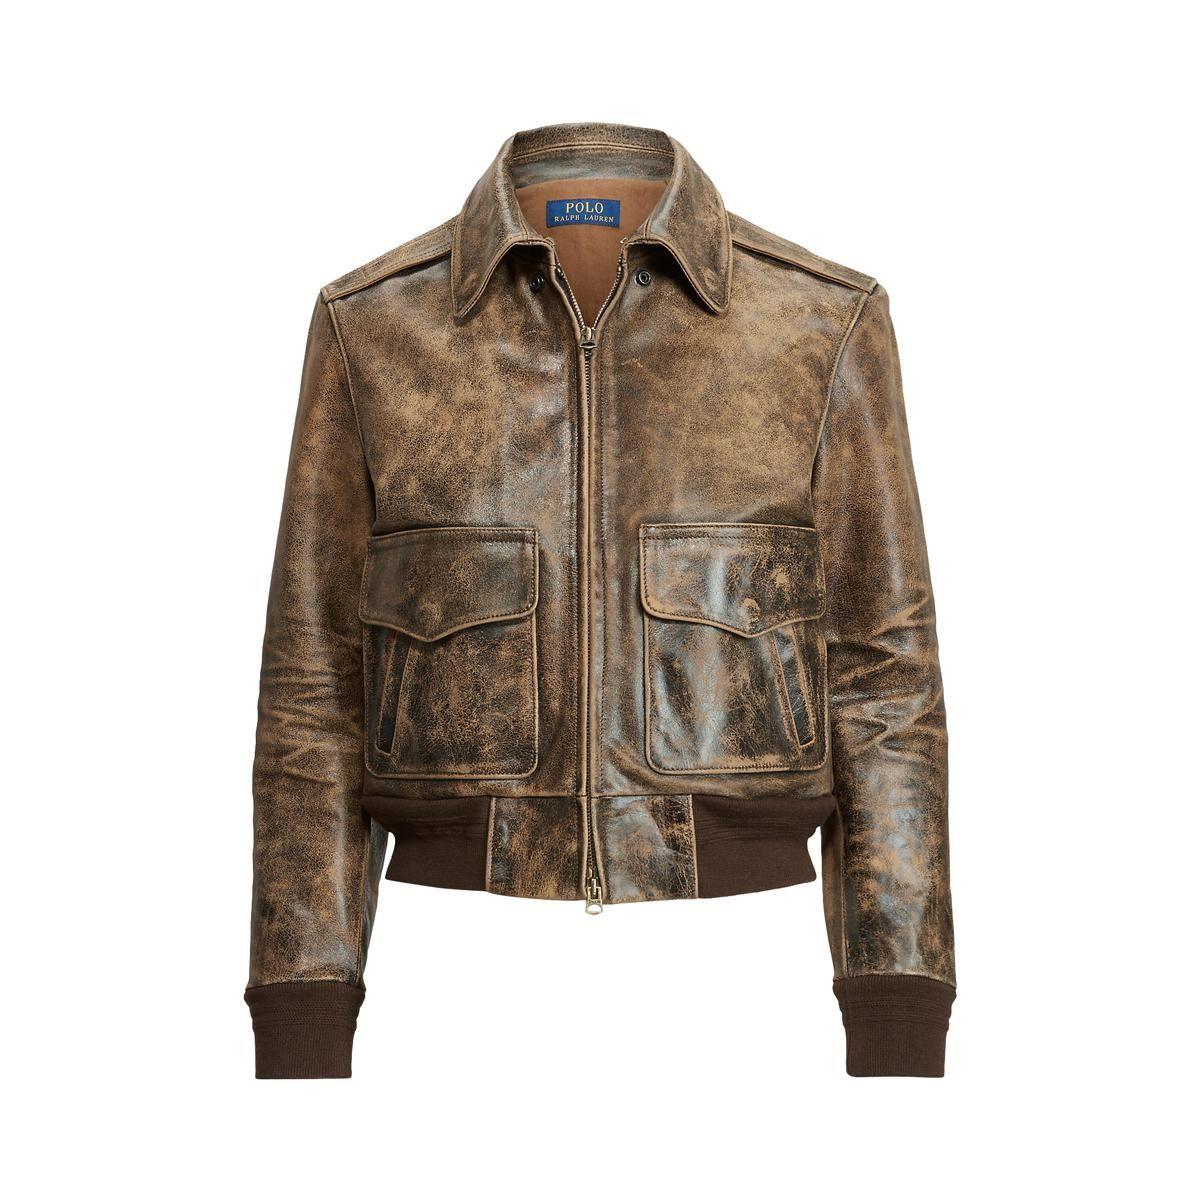 polo ralph lauren vintage leather a2 bomber jacket